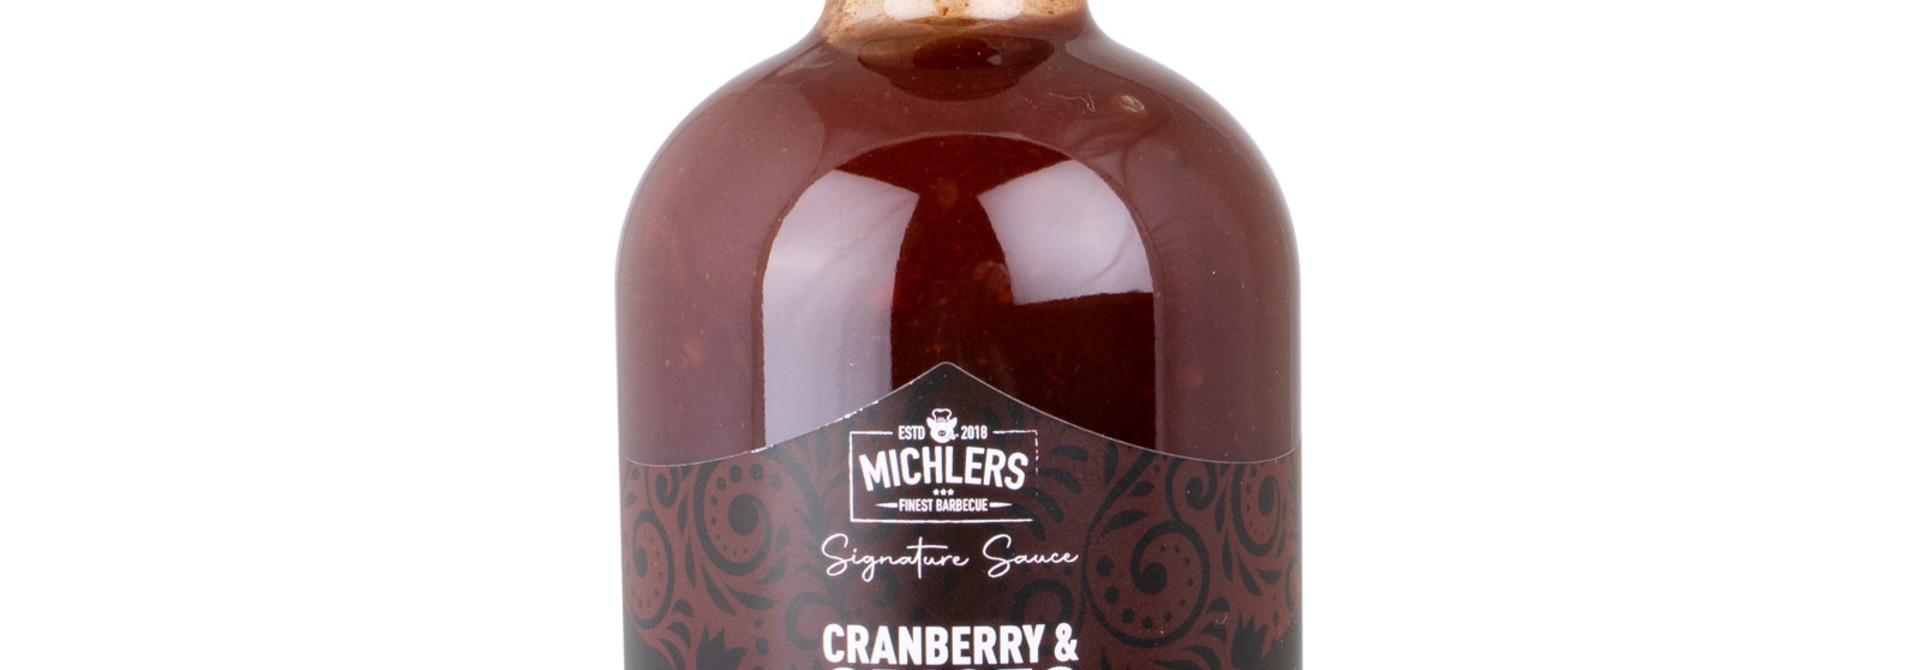 Michler's Finest - Cranberry & Spices BBQ Sauce